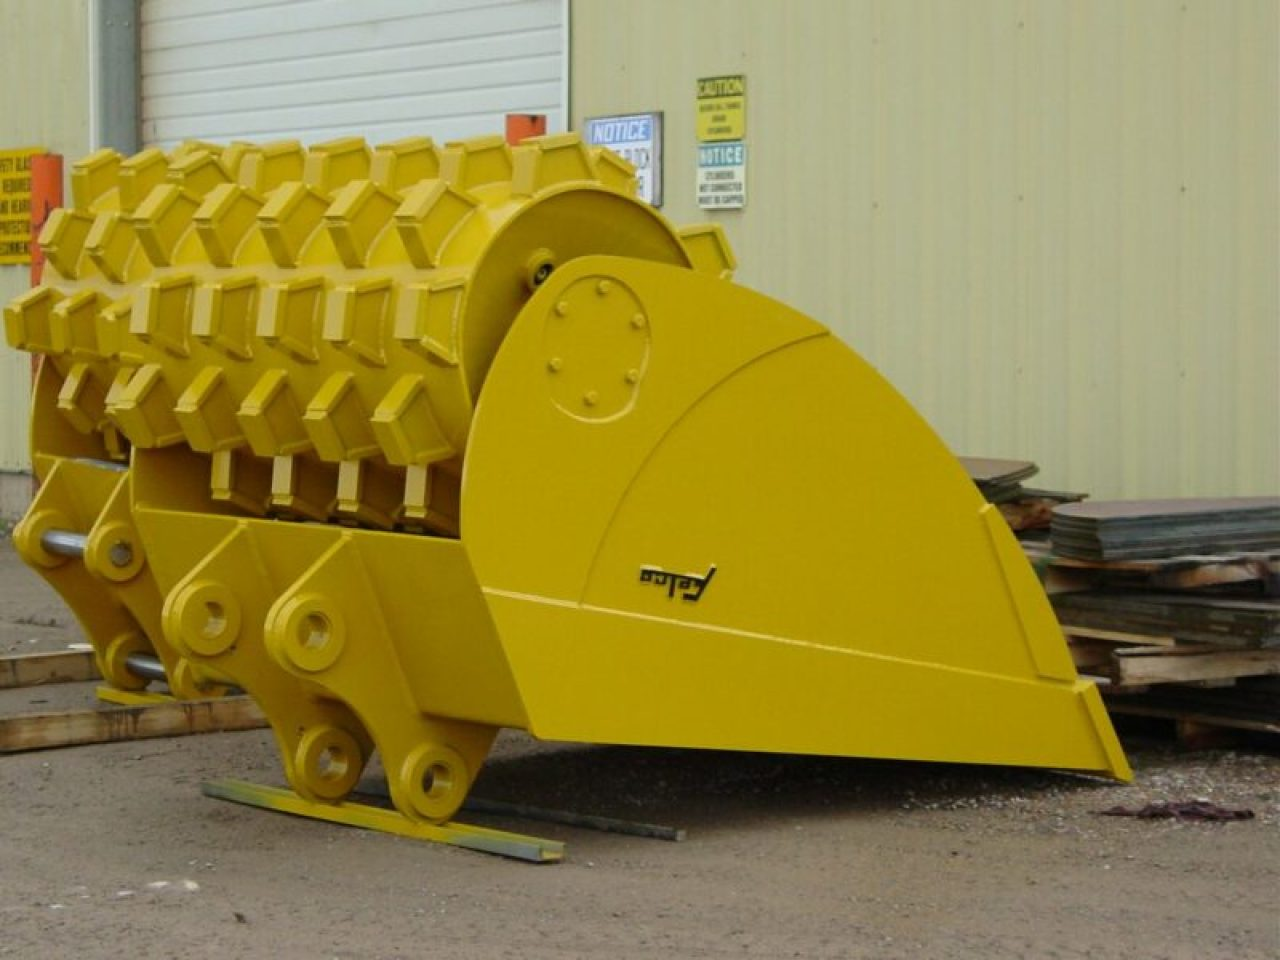 Felco Roller Compaction Bucket 18x40 - Wt. Class 10-32K 231770